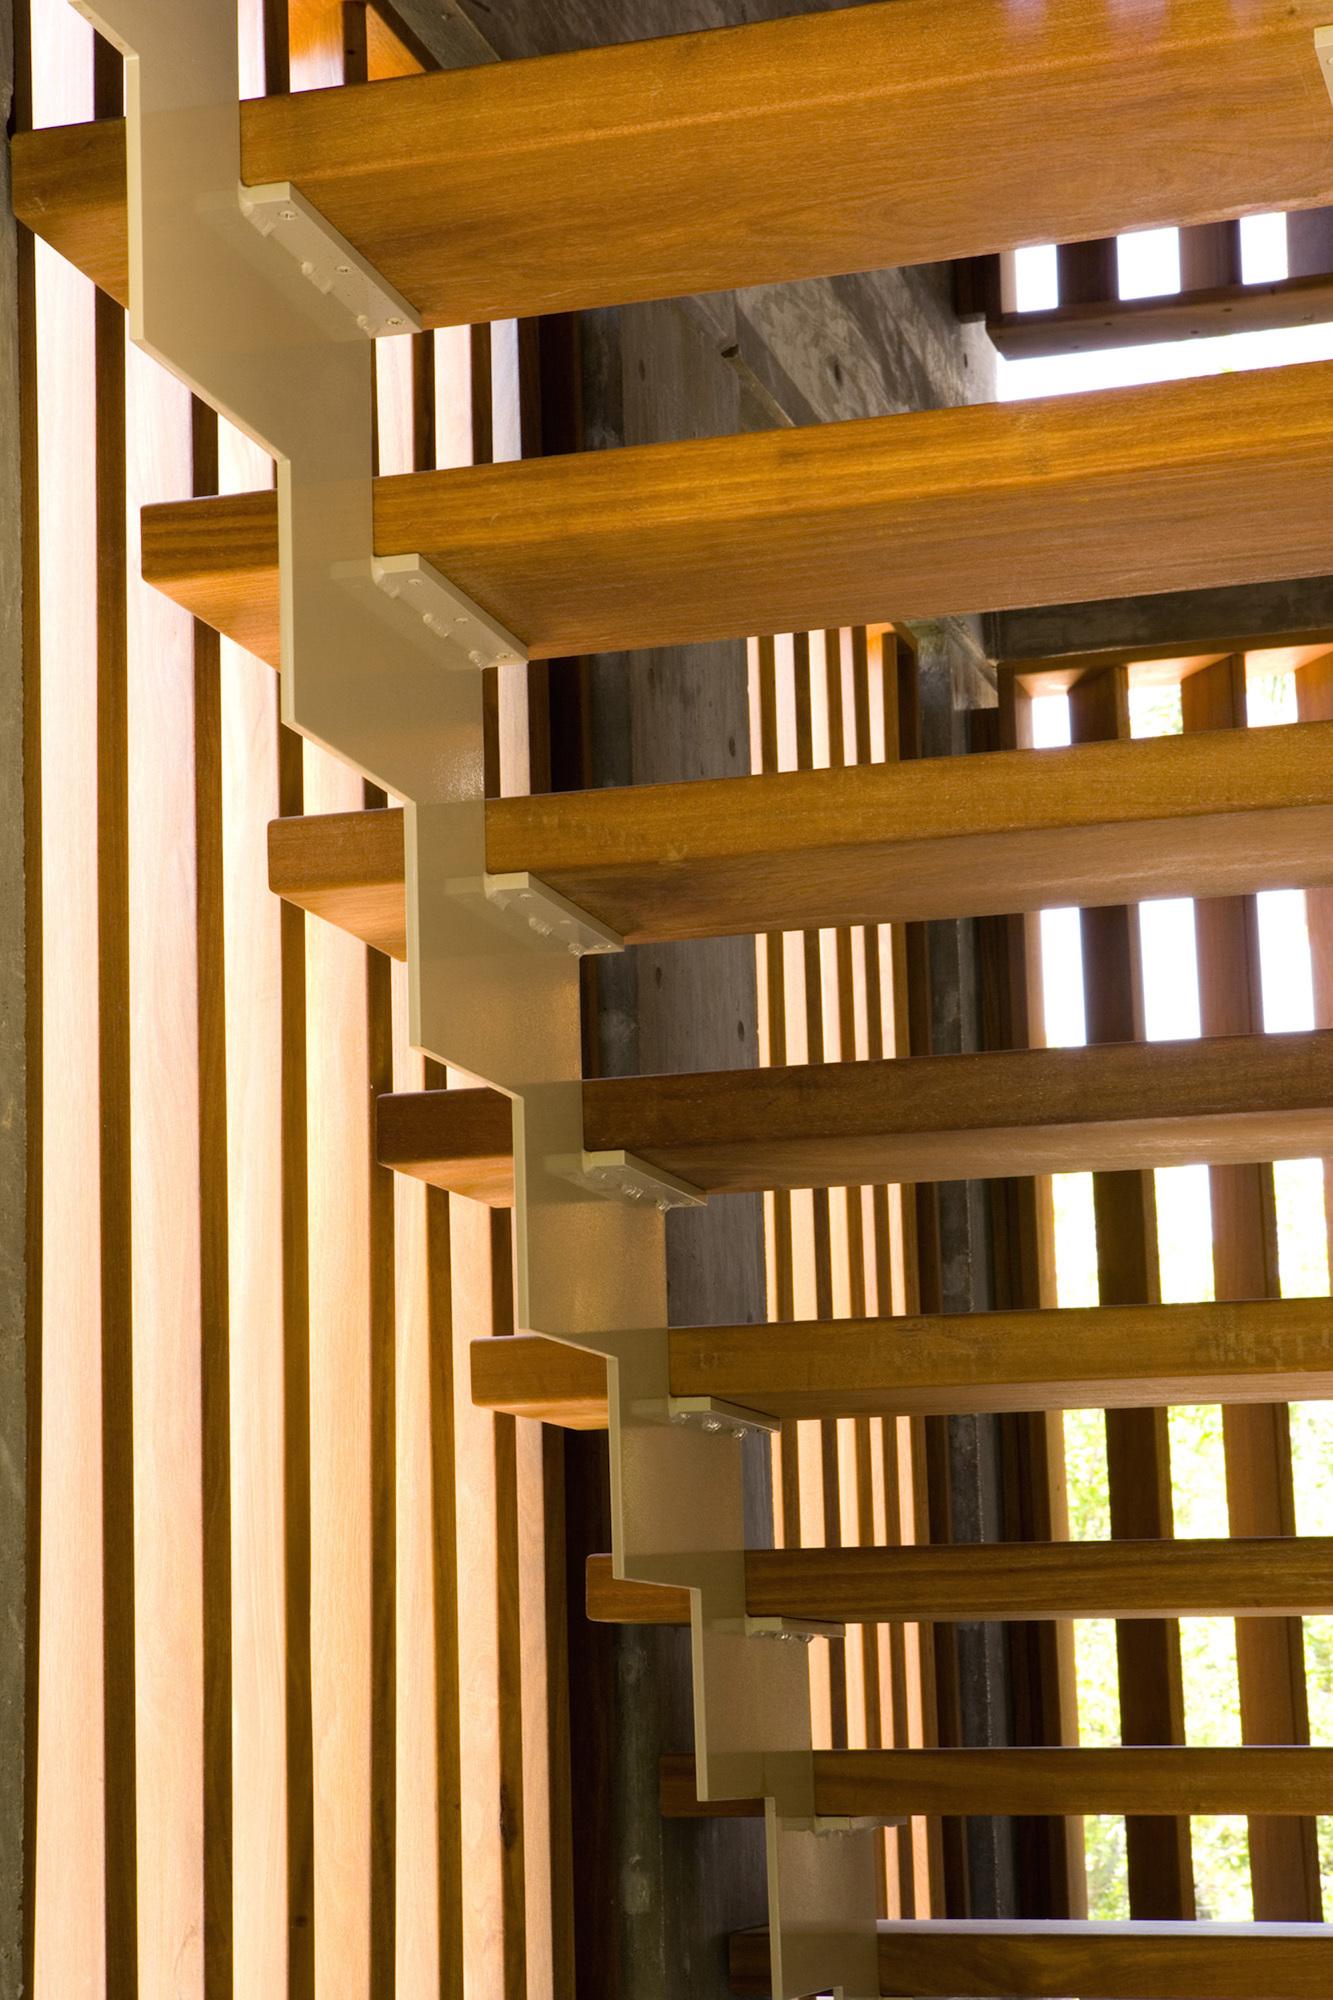 residencia-tavernier-drive-luis-pons-design-lab_eric_carle_060407_056